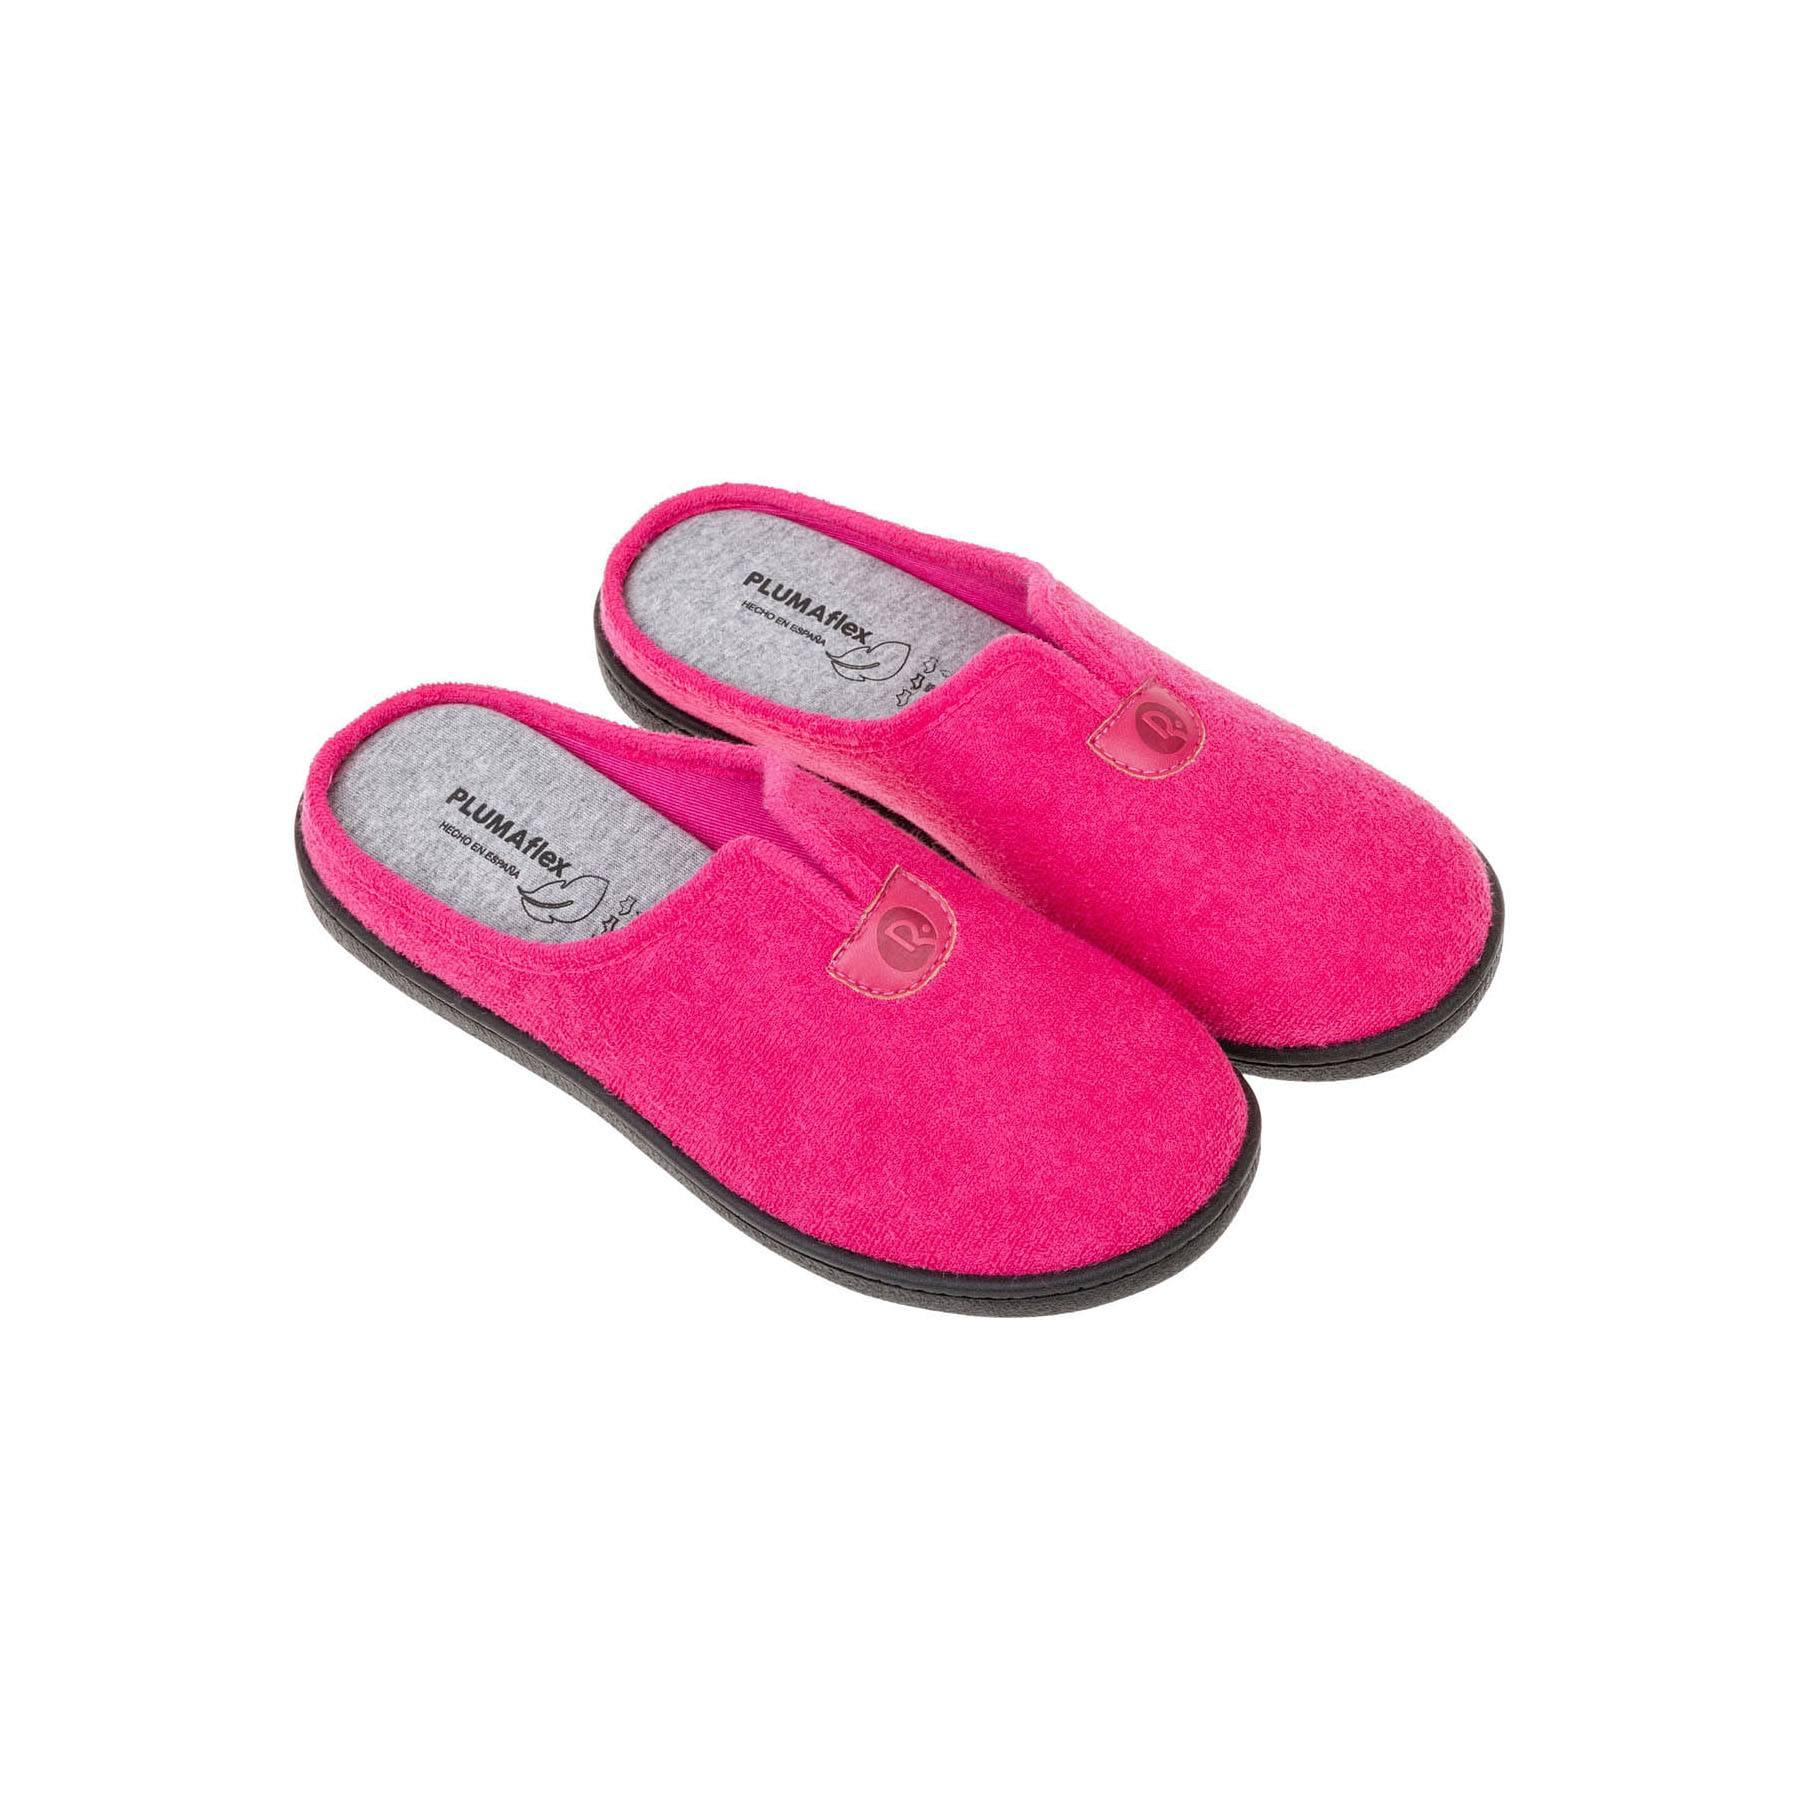 Zapatilla descalza rizo Plumaflex (varios colores)